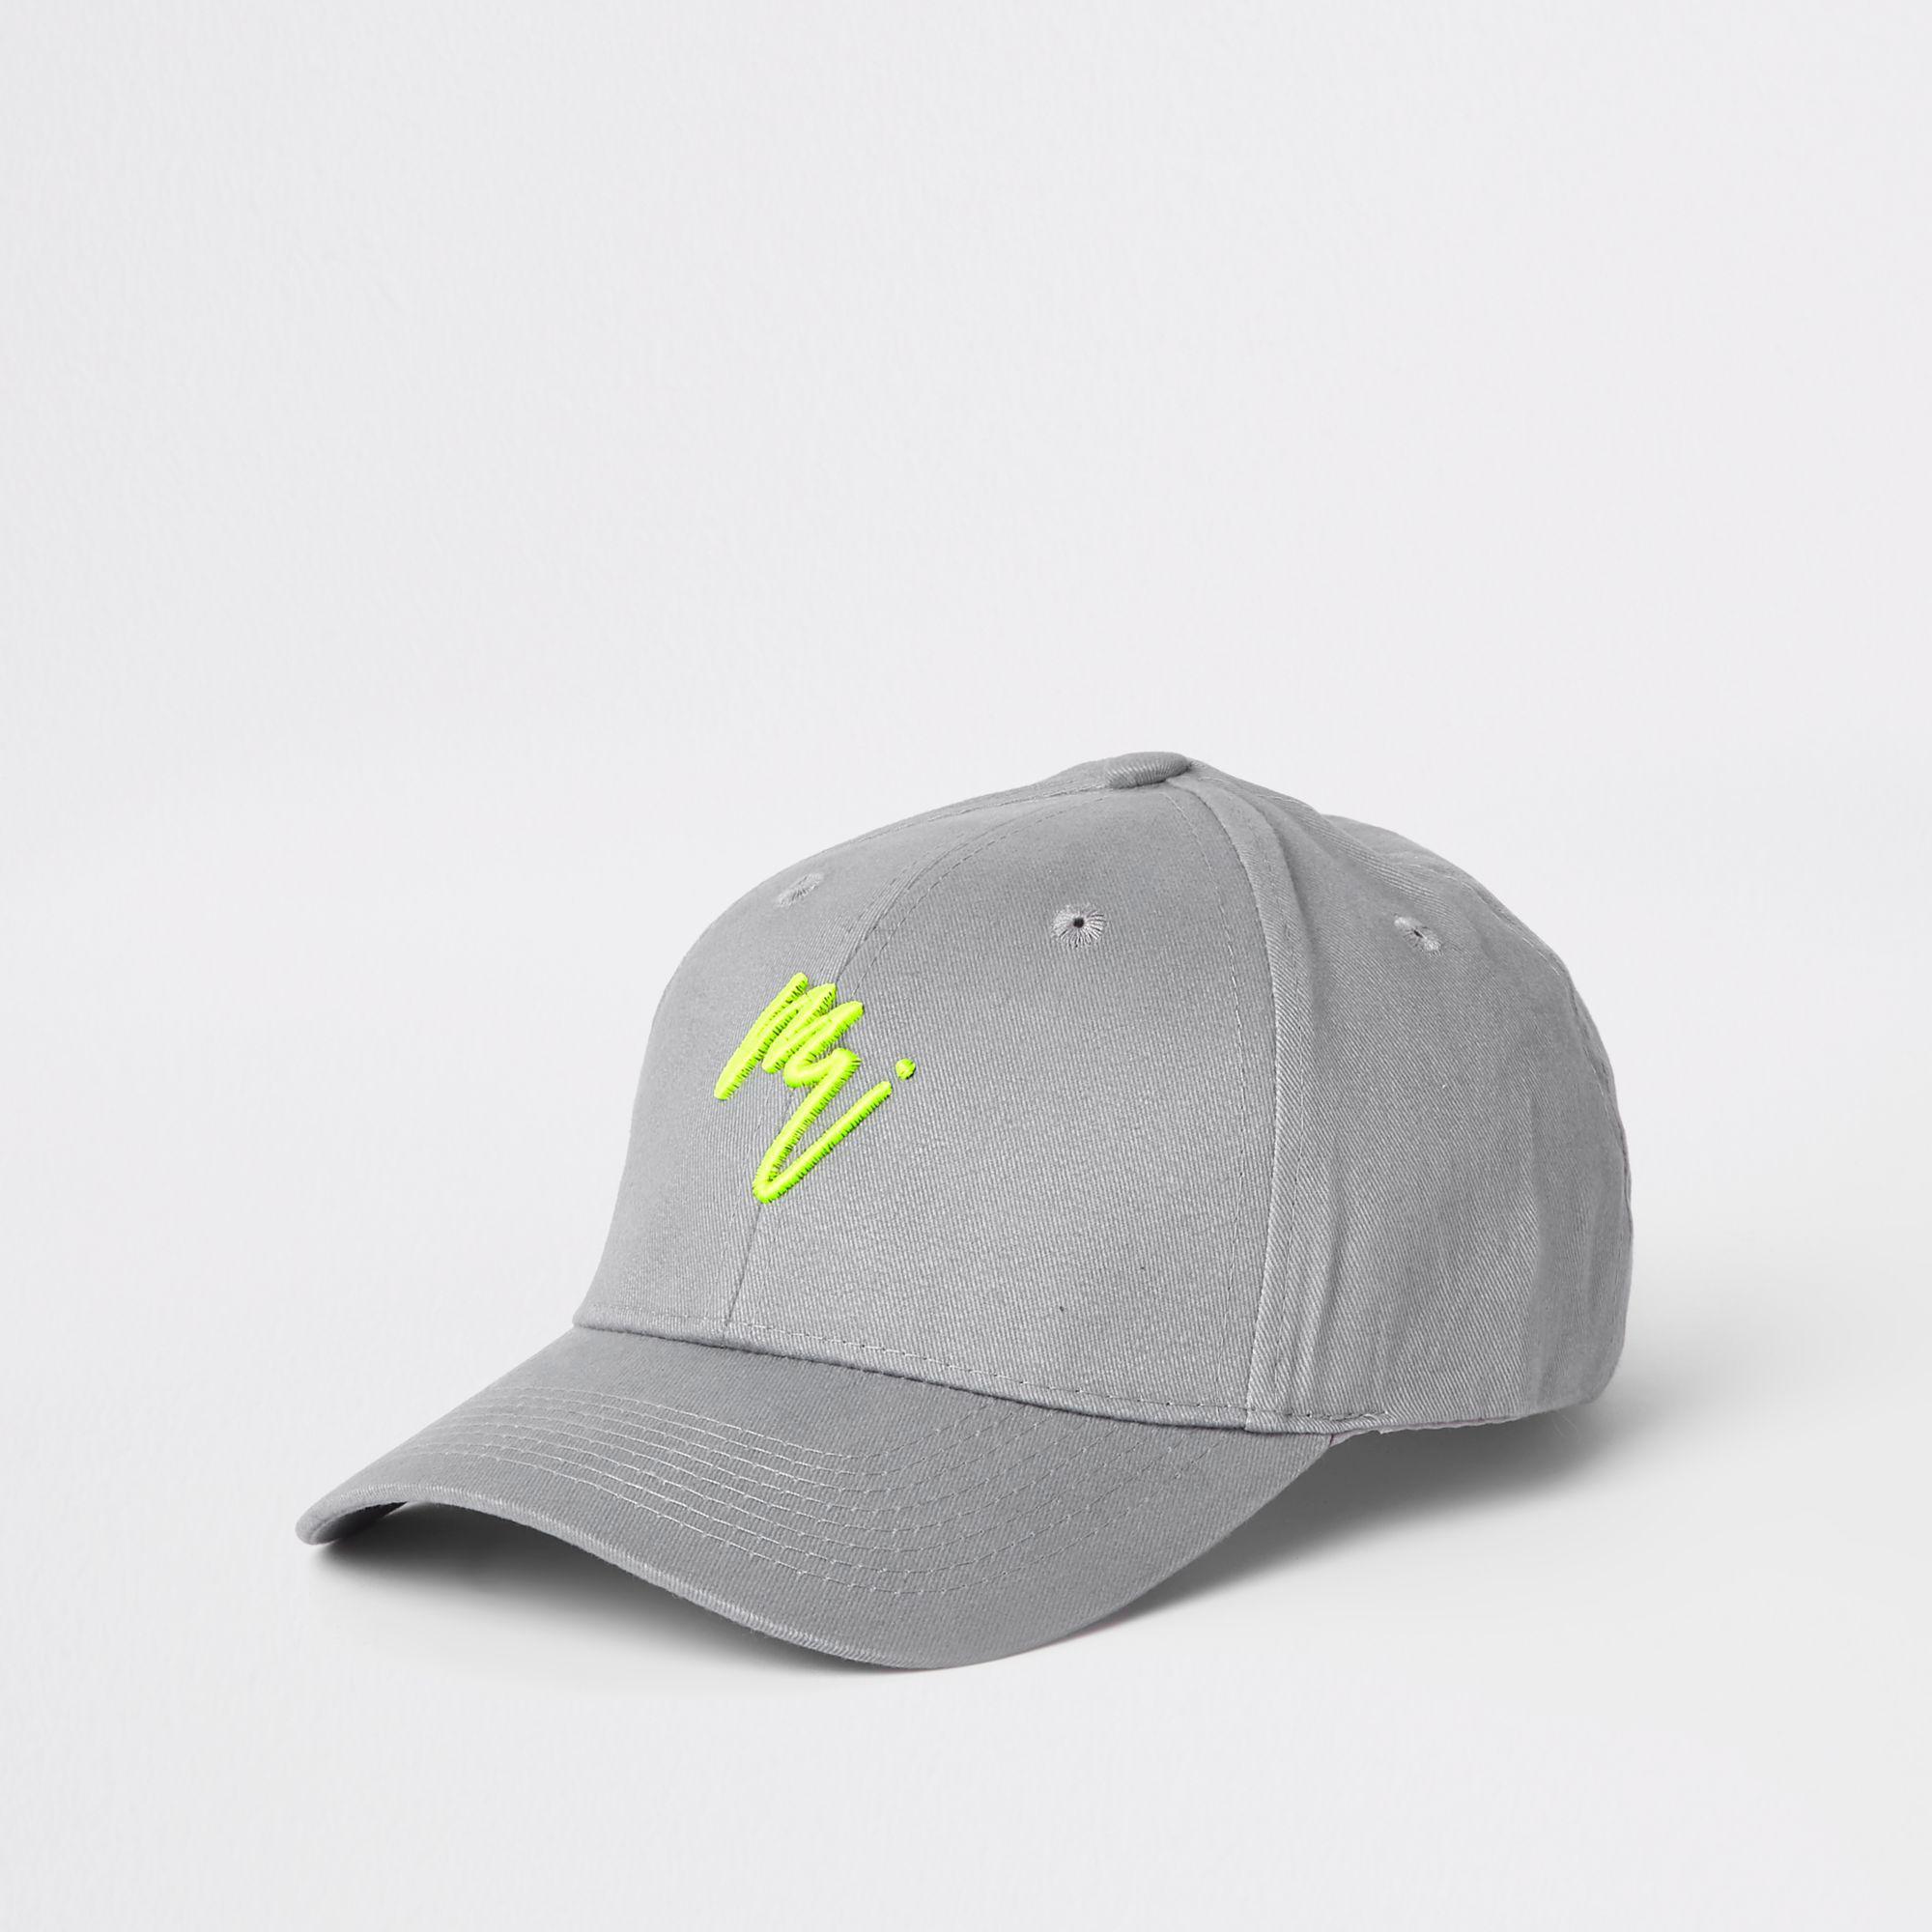 7addffe4690067 River Island 'maison Riviera' Neon Baseball Cap in Gray for Men - Lyst